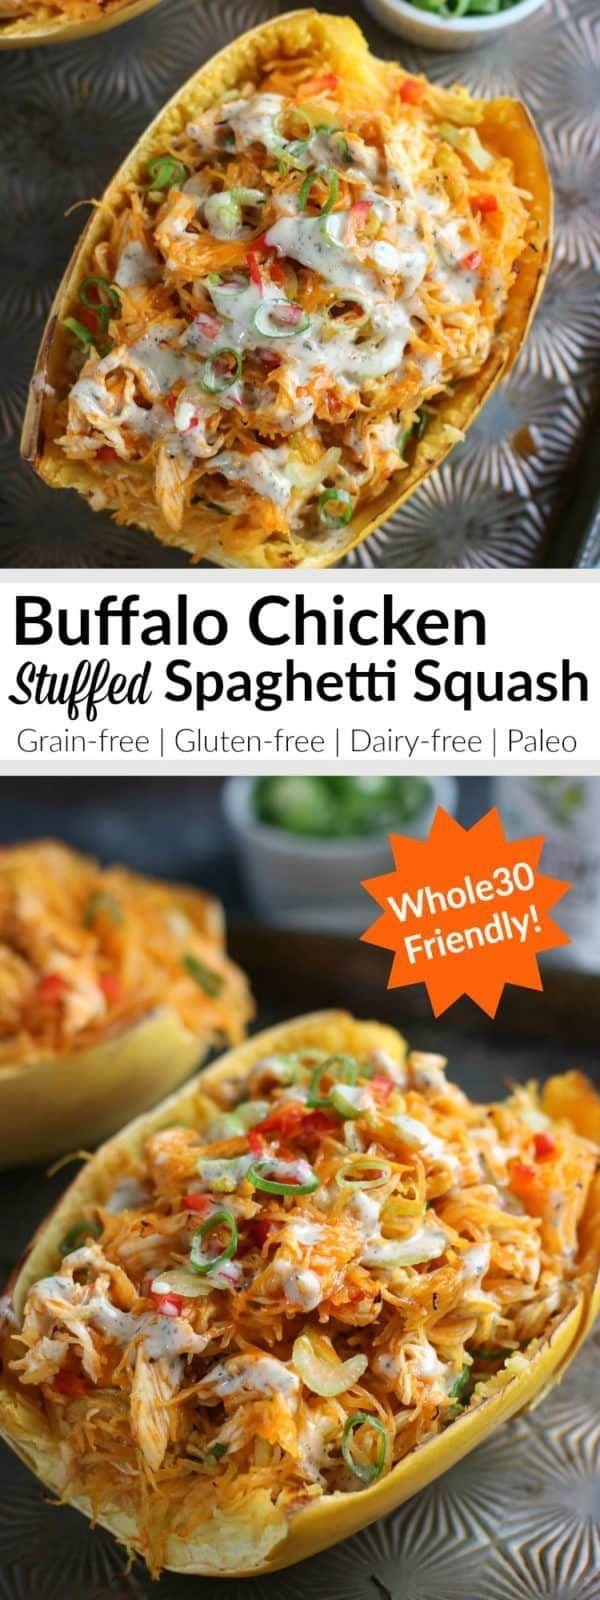 Buffalo Chicken Stuffed Spaghetti Squash - The Real Food Dietitians